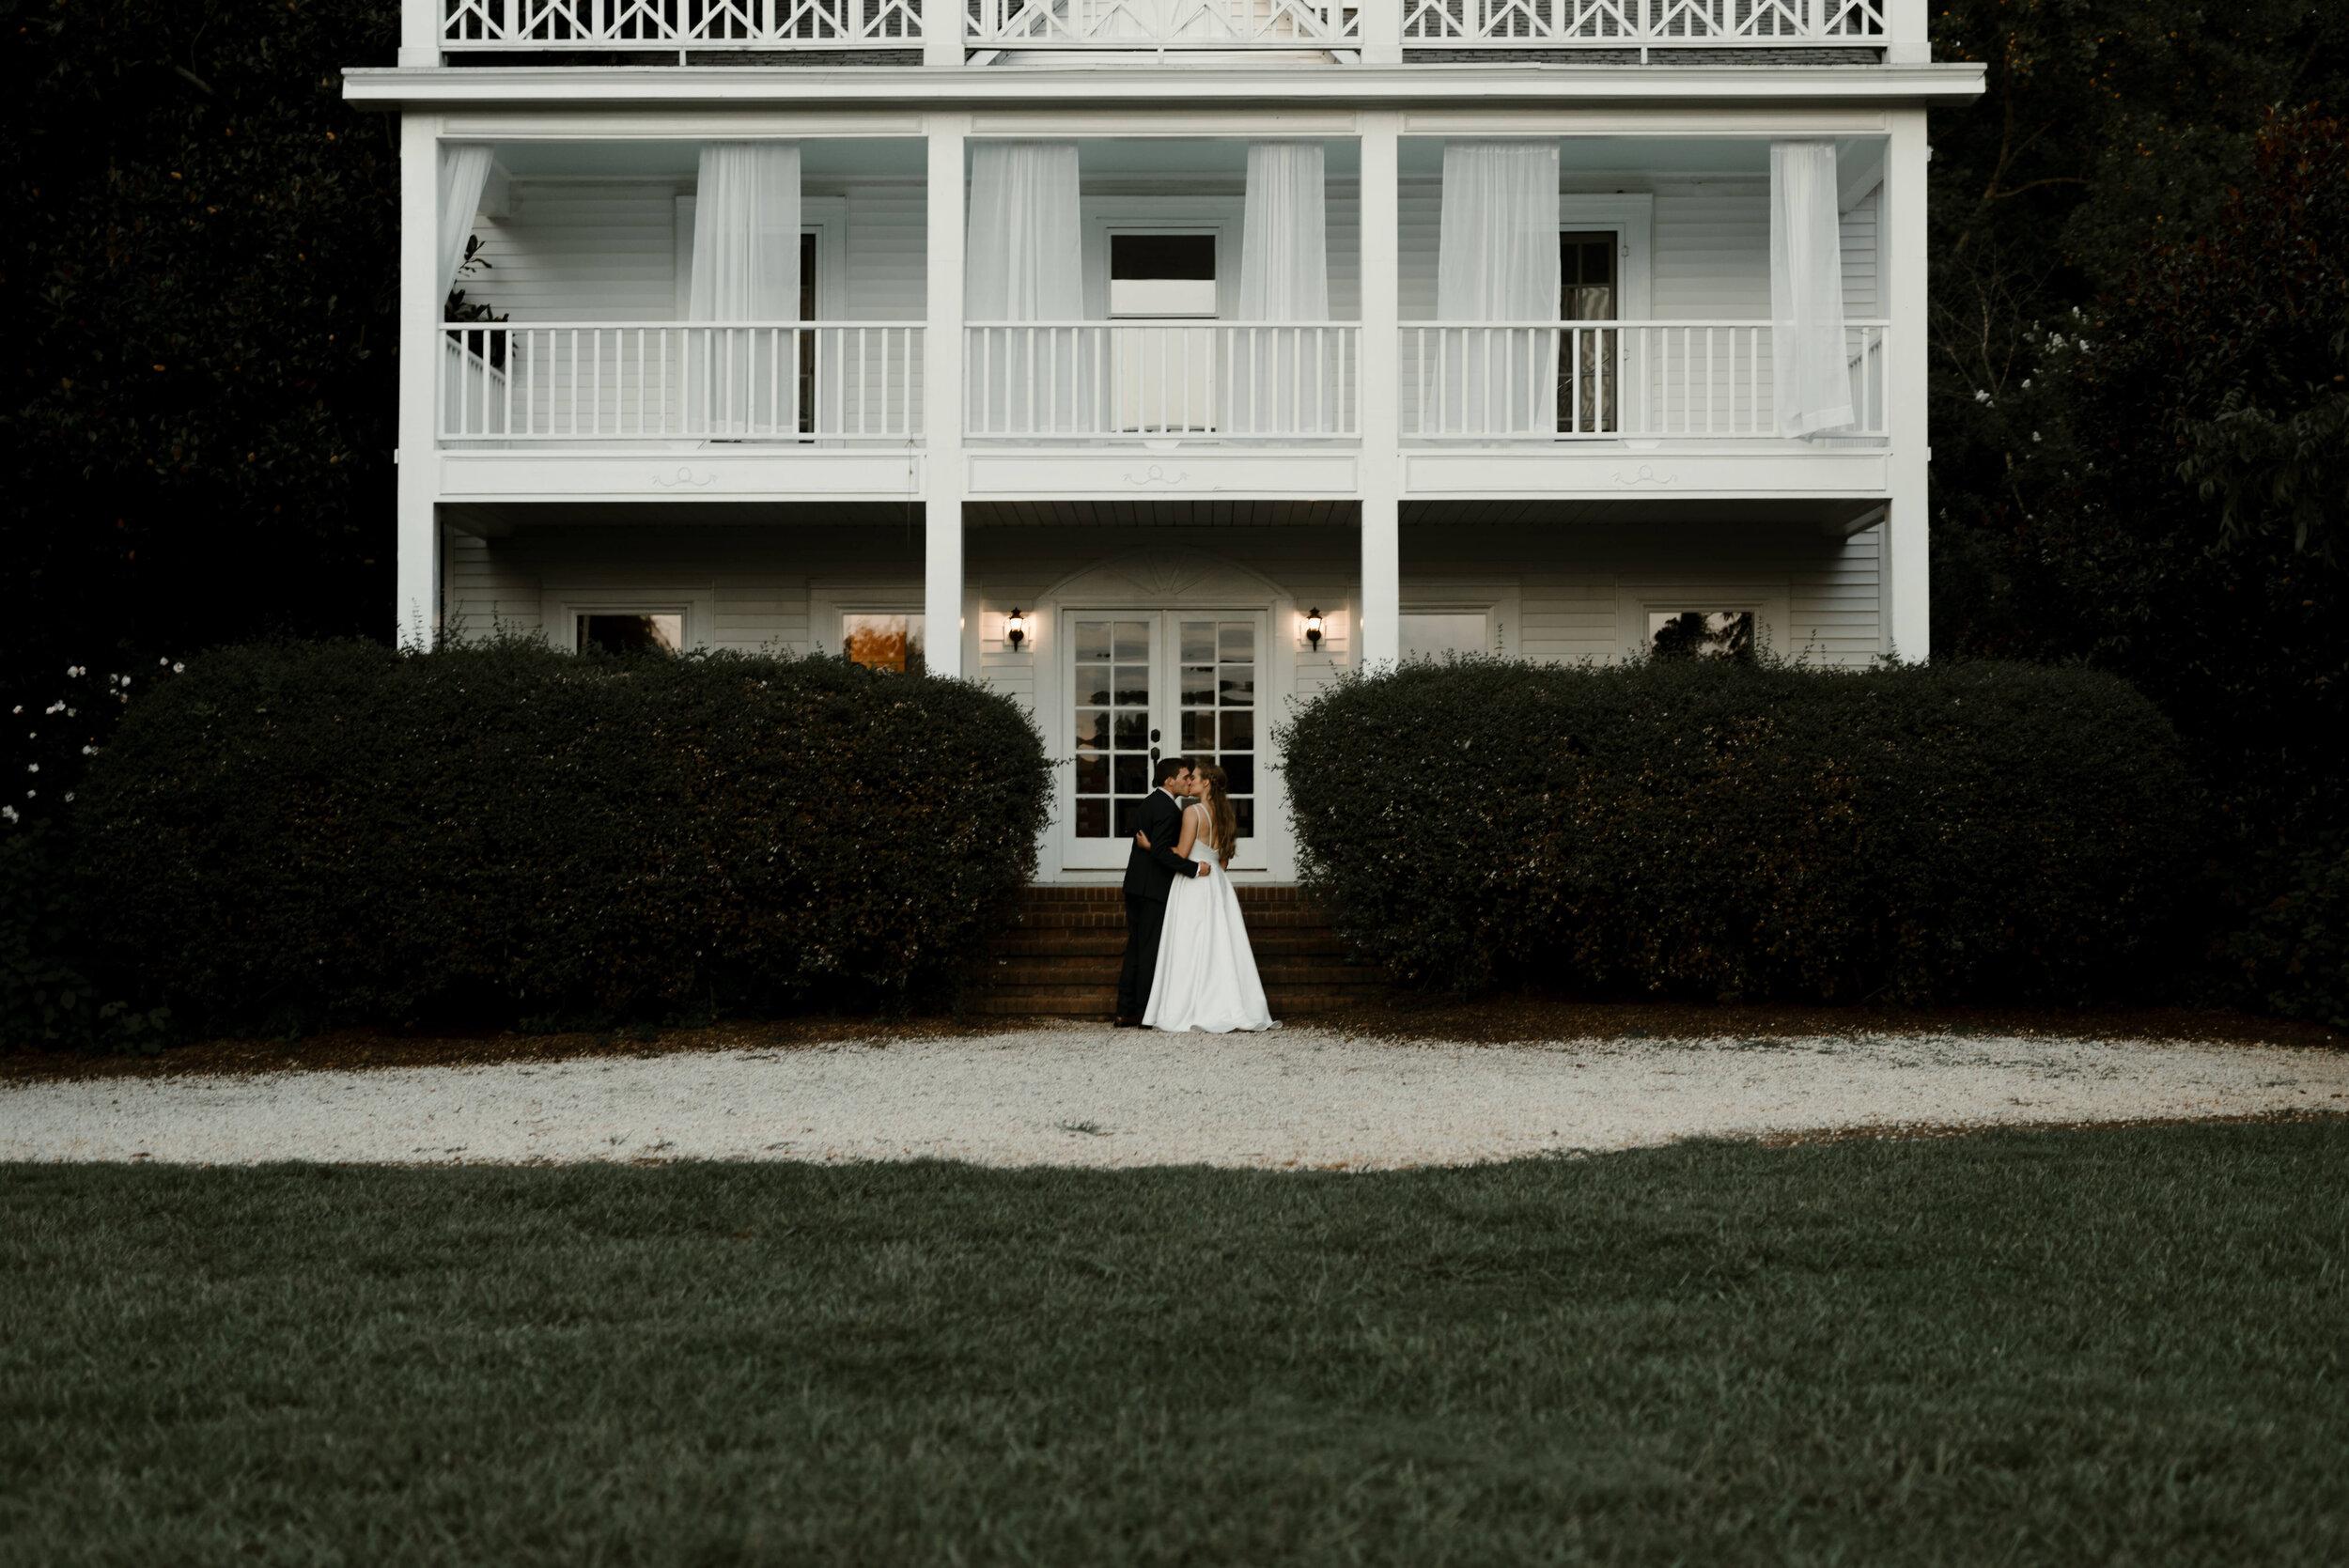 RALEIGH_WEDDING_GABBY_AND_SMITTYDSC_8094.jpg